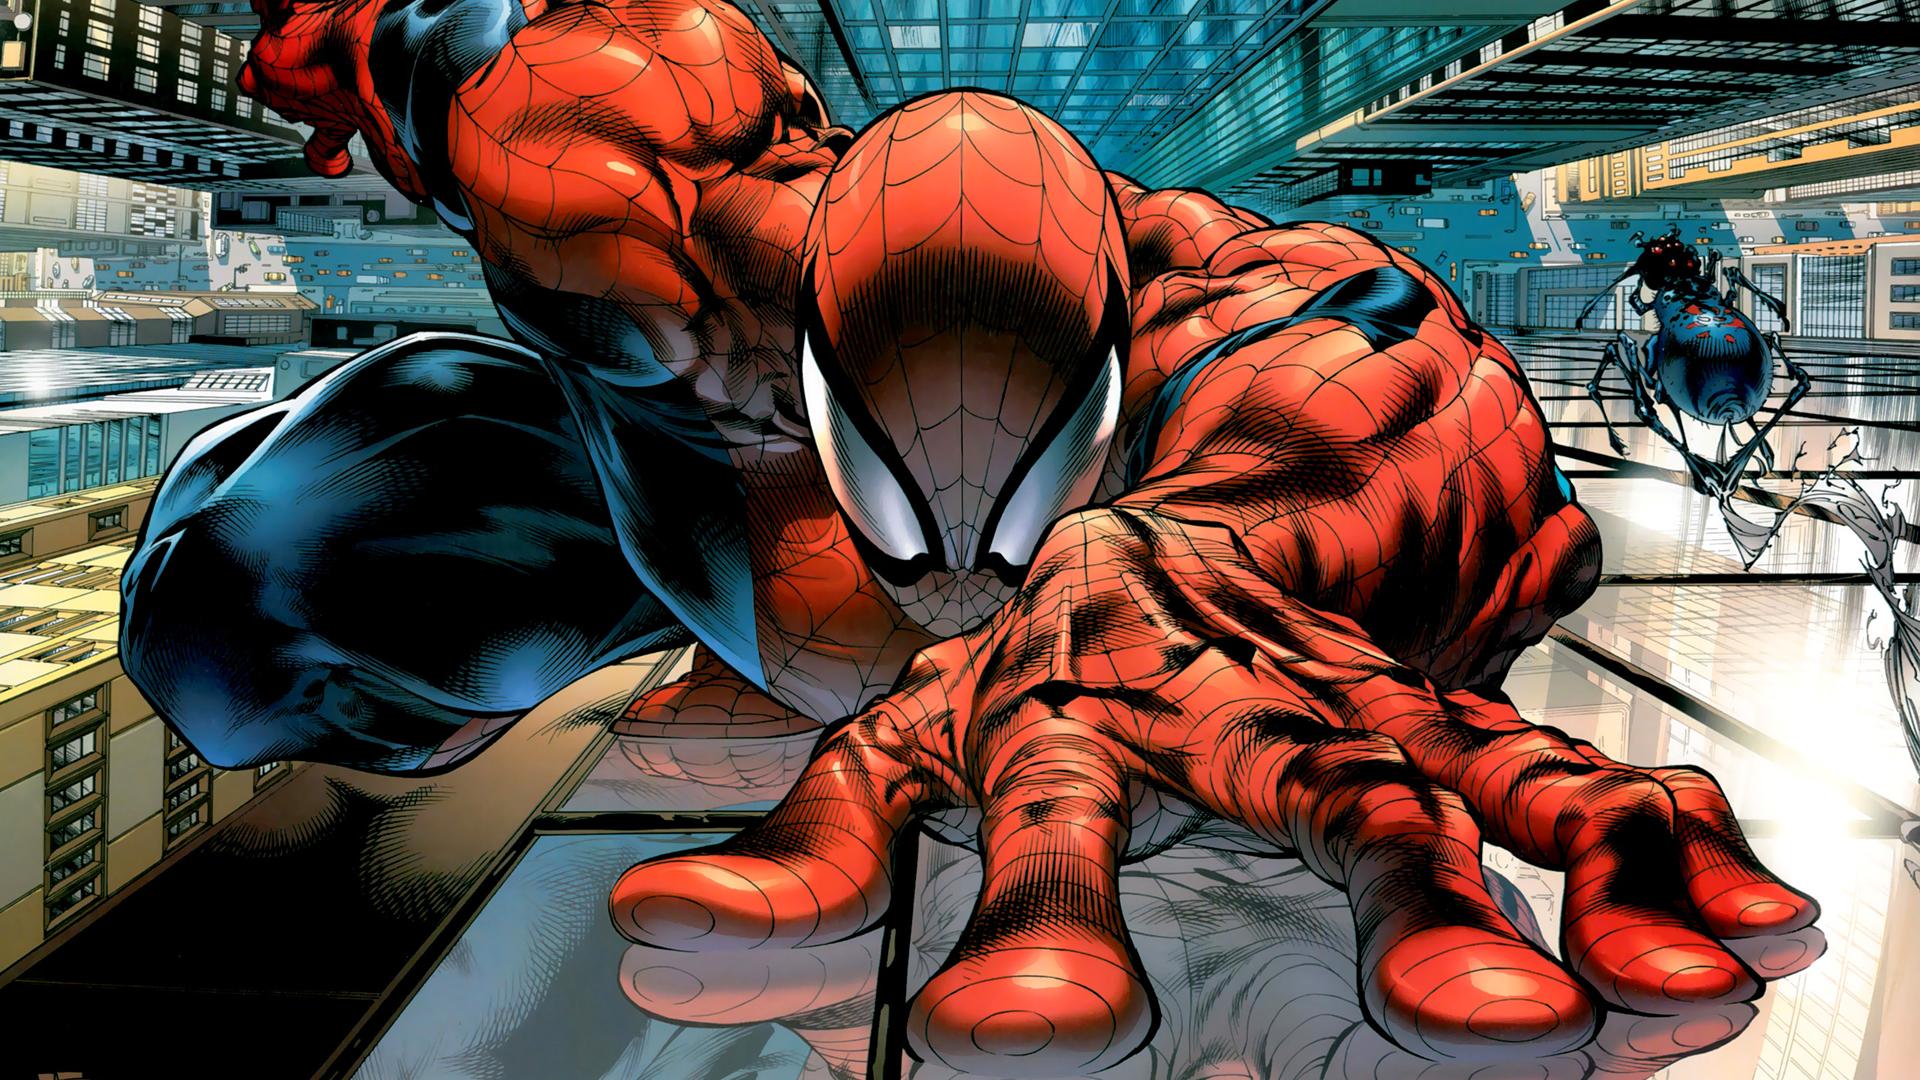 Spider man hd wallpapers 1080p wallpapersafari - Marvel android wallpaper hd ...